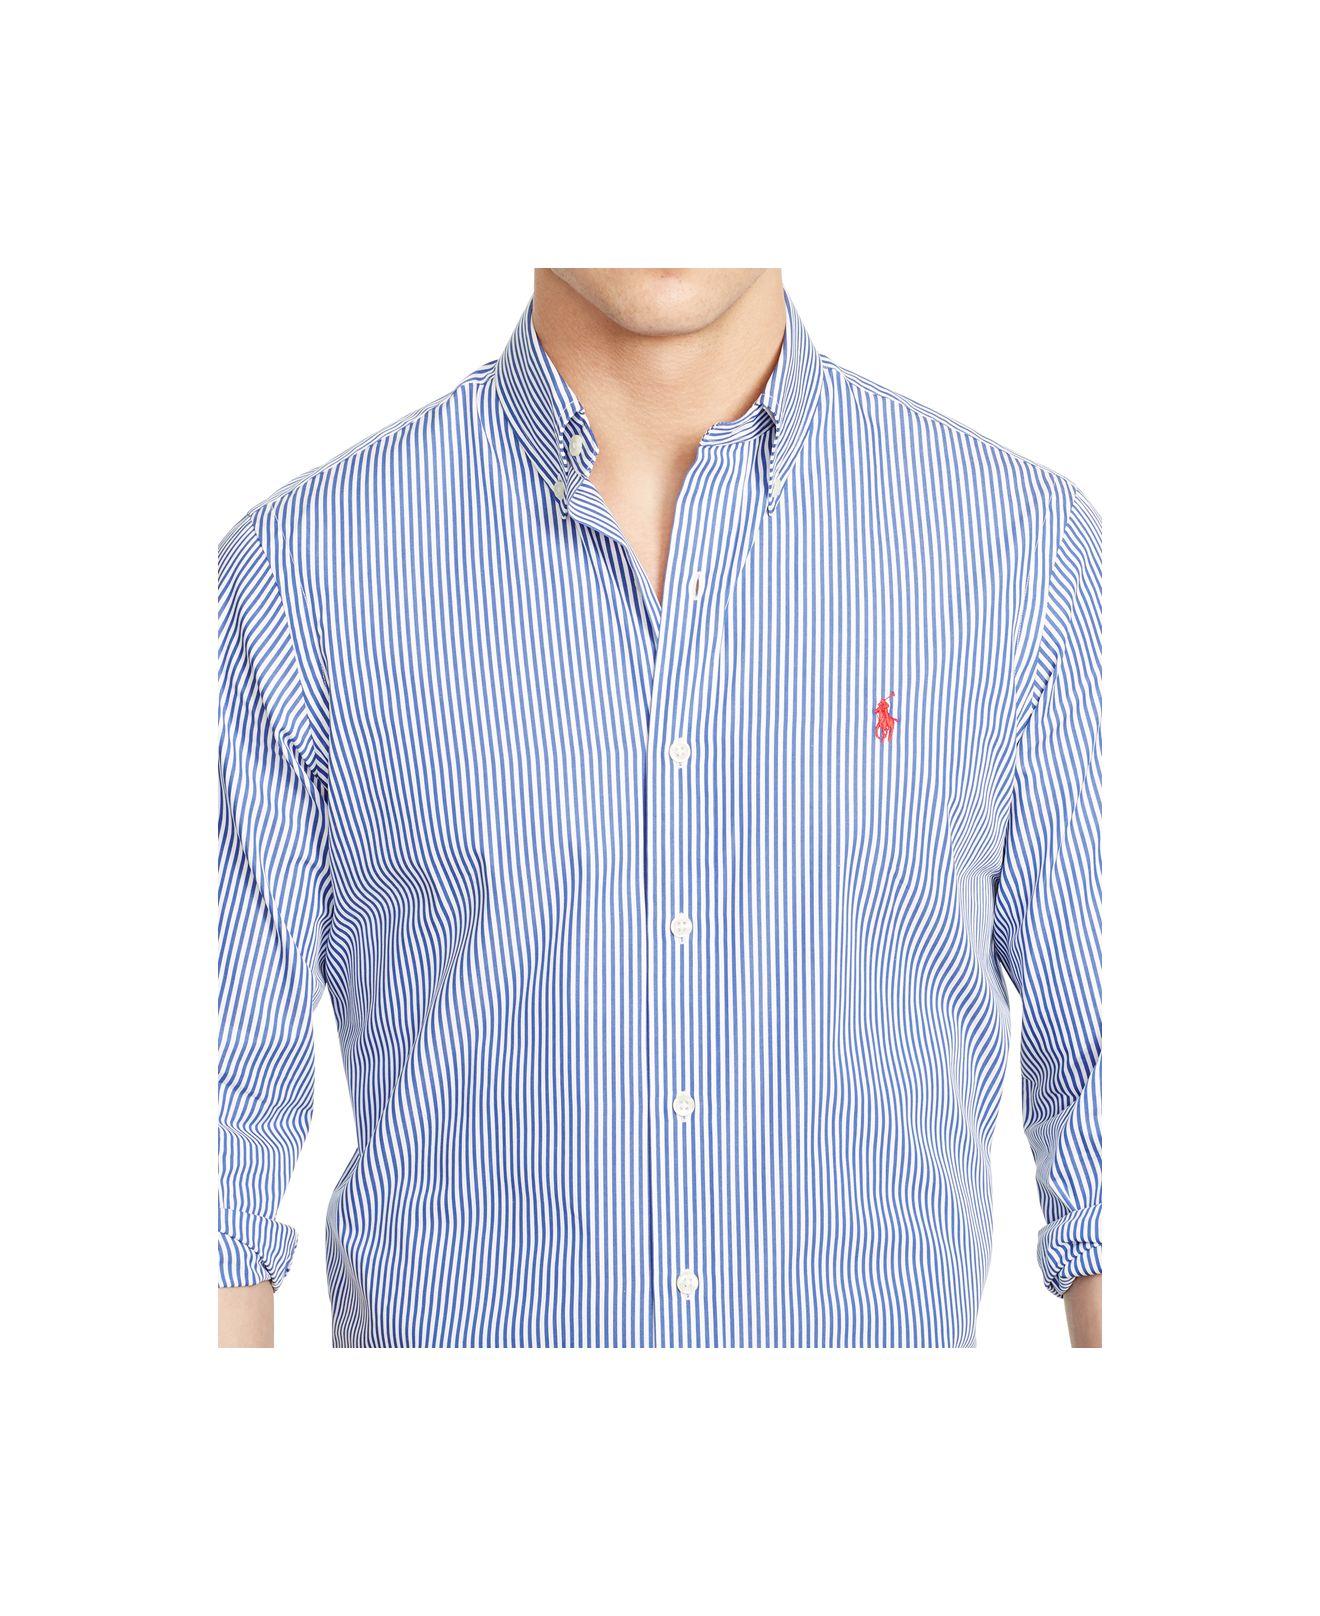 ede2dd8e5a4 Lyst - Polo Ralph Lauren Slim-fit Striped Poplin Shirt in Blue for Men